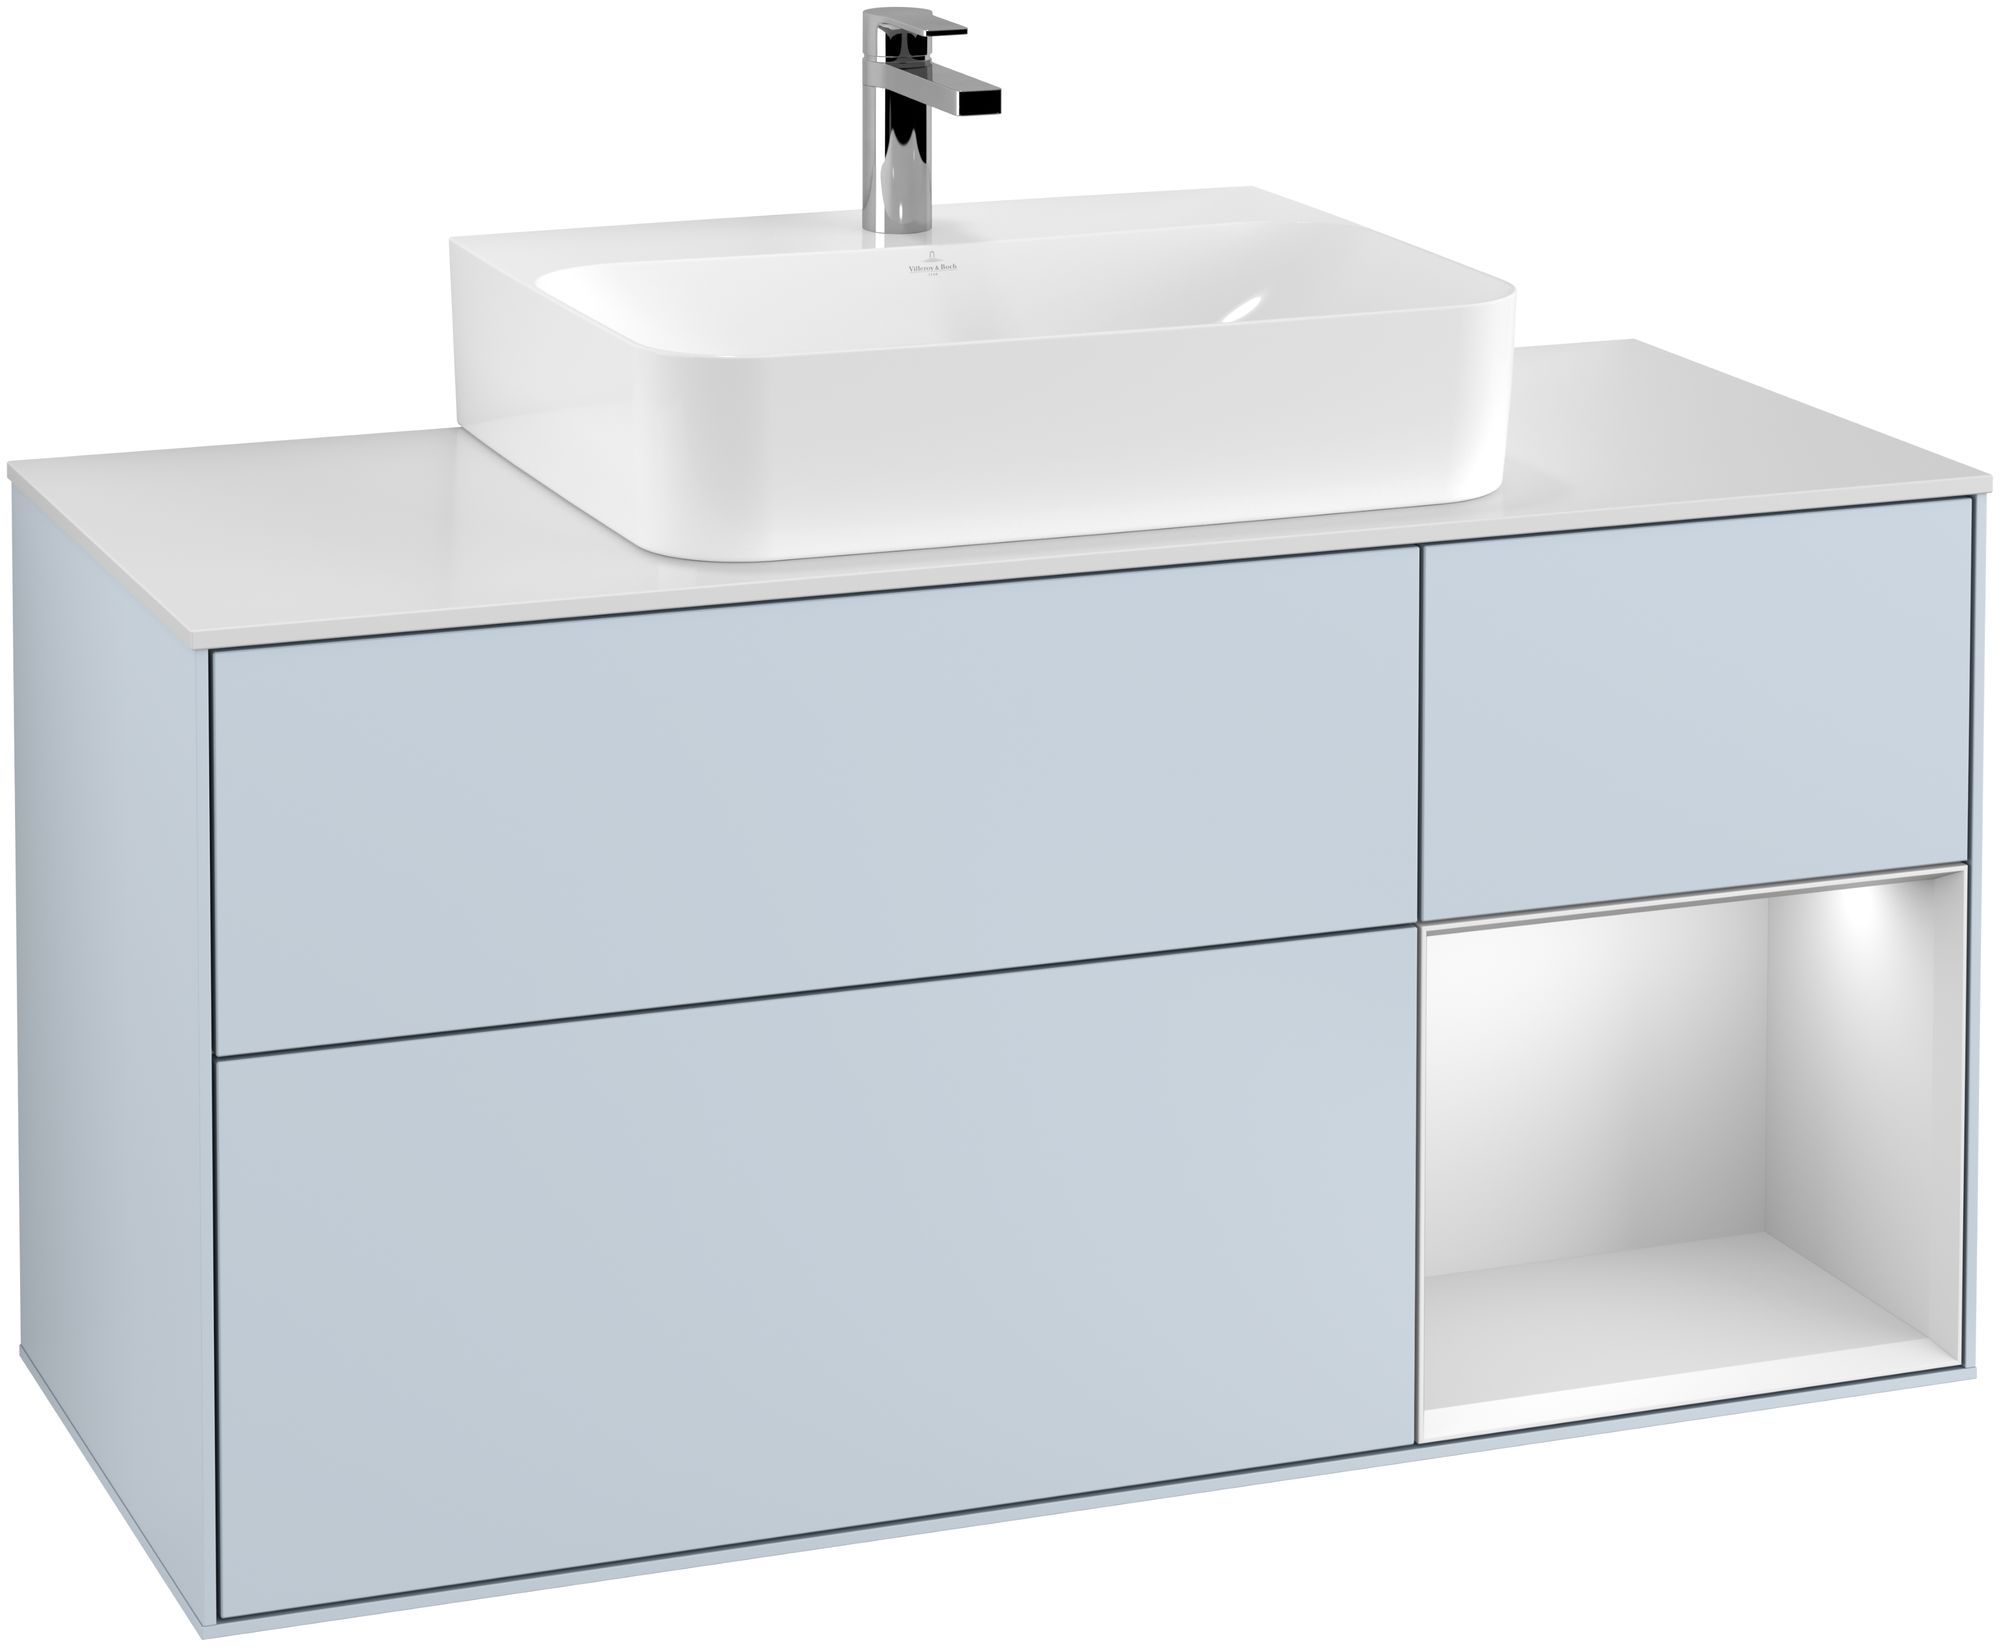 Villeroy & Boch Finion F17 Waschtischunterschrank mit Regalelement 3 Auszüge Waschtisch mittig LED-Beleuchtung B:120xH:60,3xT:50,1cm Front, Korpus: Cloud, Regal: Weiß Matt Soft Grey, Glasplatte: White Matt F171MTHA